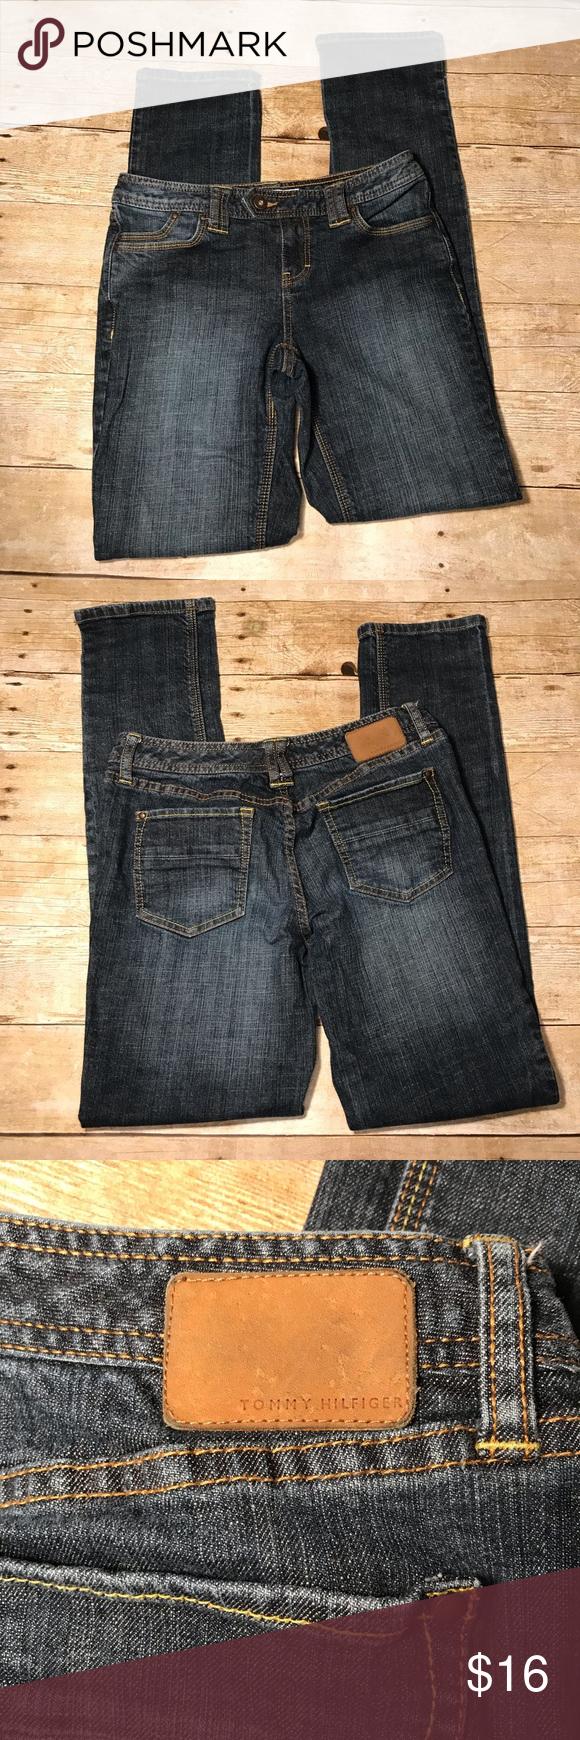 "b5b93fe5 Women's Tommy Hilfiger Skinny Jeans size 4 Tommy Hilfiger Jeans size 4  Skinny Length 39"" Inseam 31"" Tommy Hilfiger Jeans Skinny"